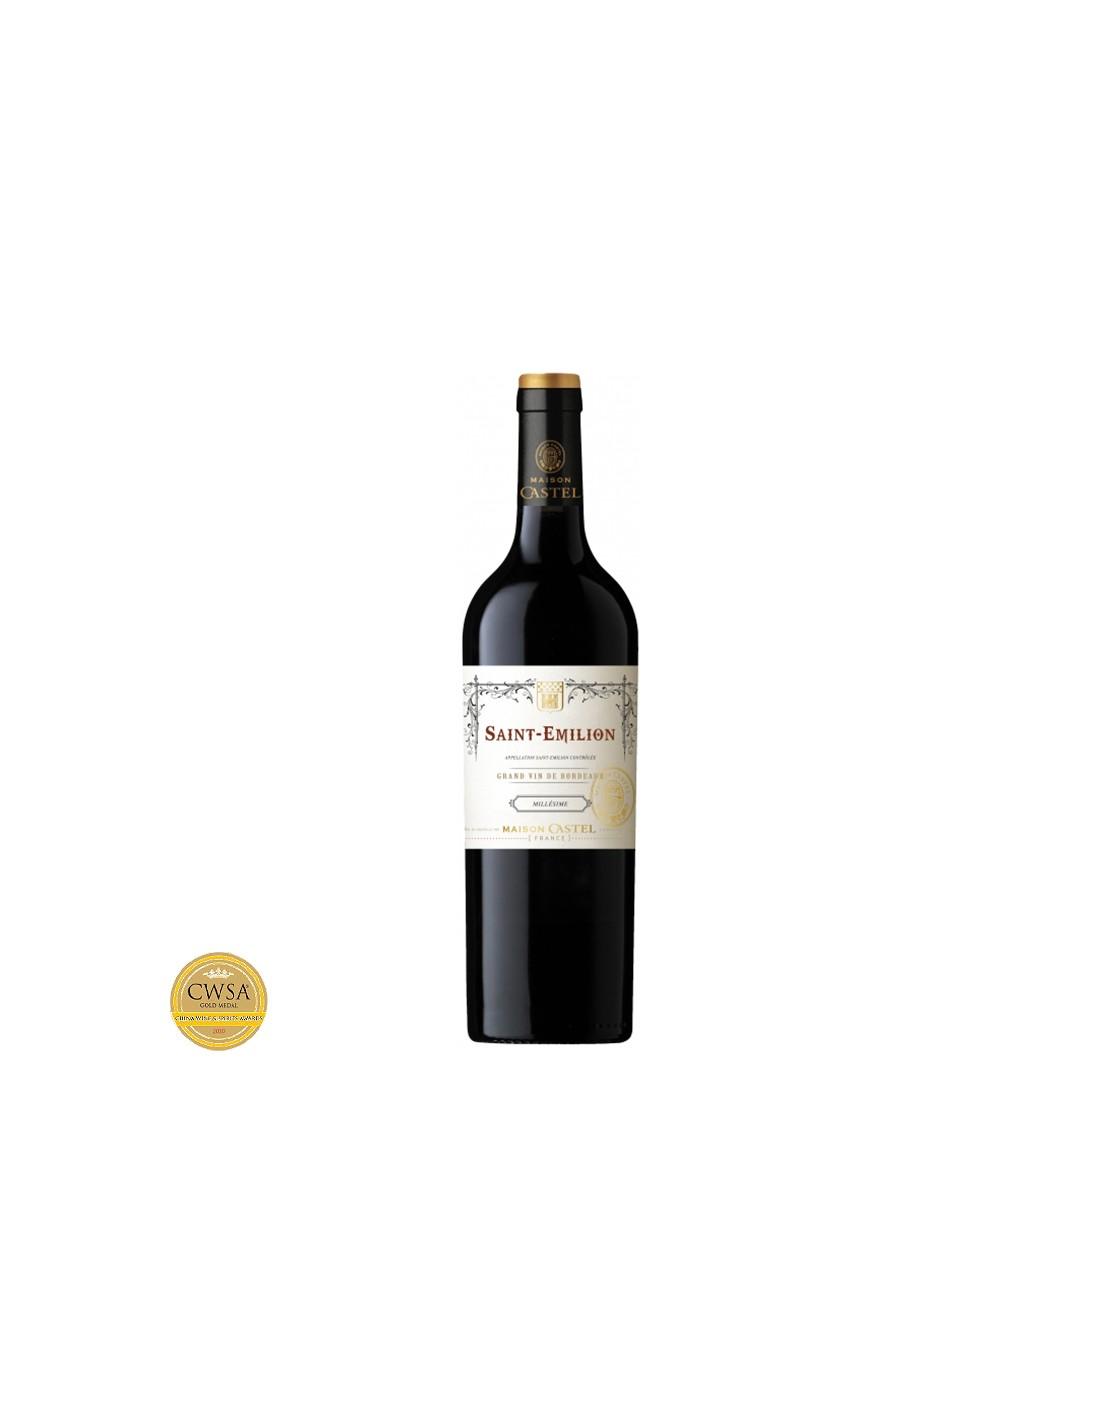 Vin rosu, Cupaj, Maison Castel Saint-Émilion, 0.75L, 12.9% alc., Franta